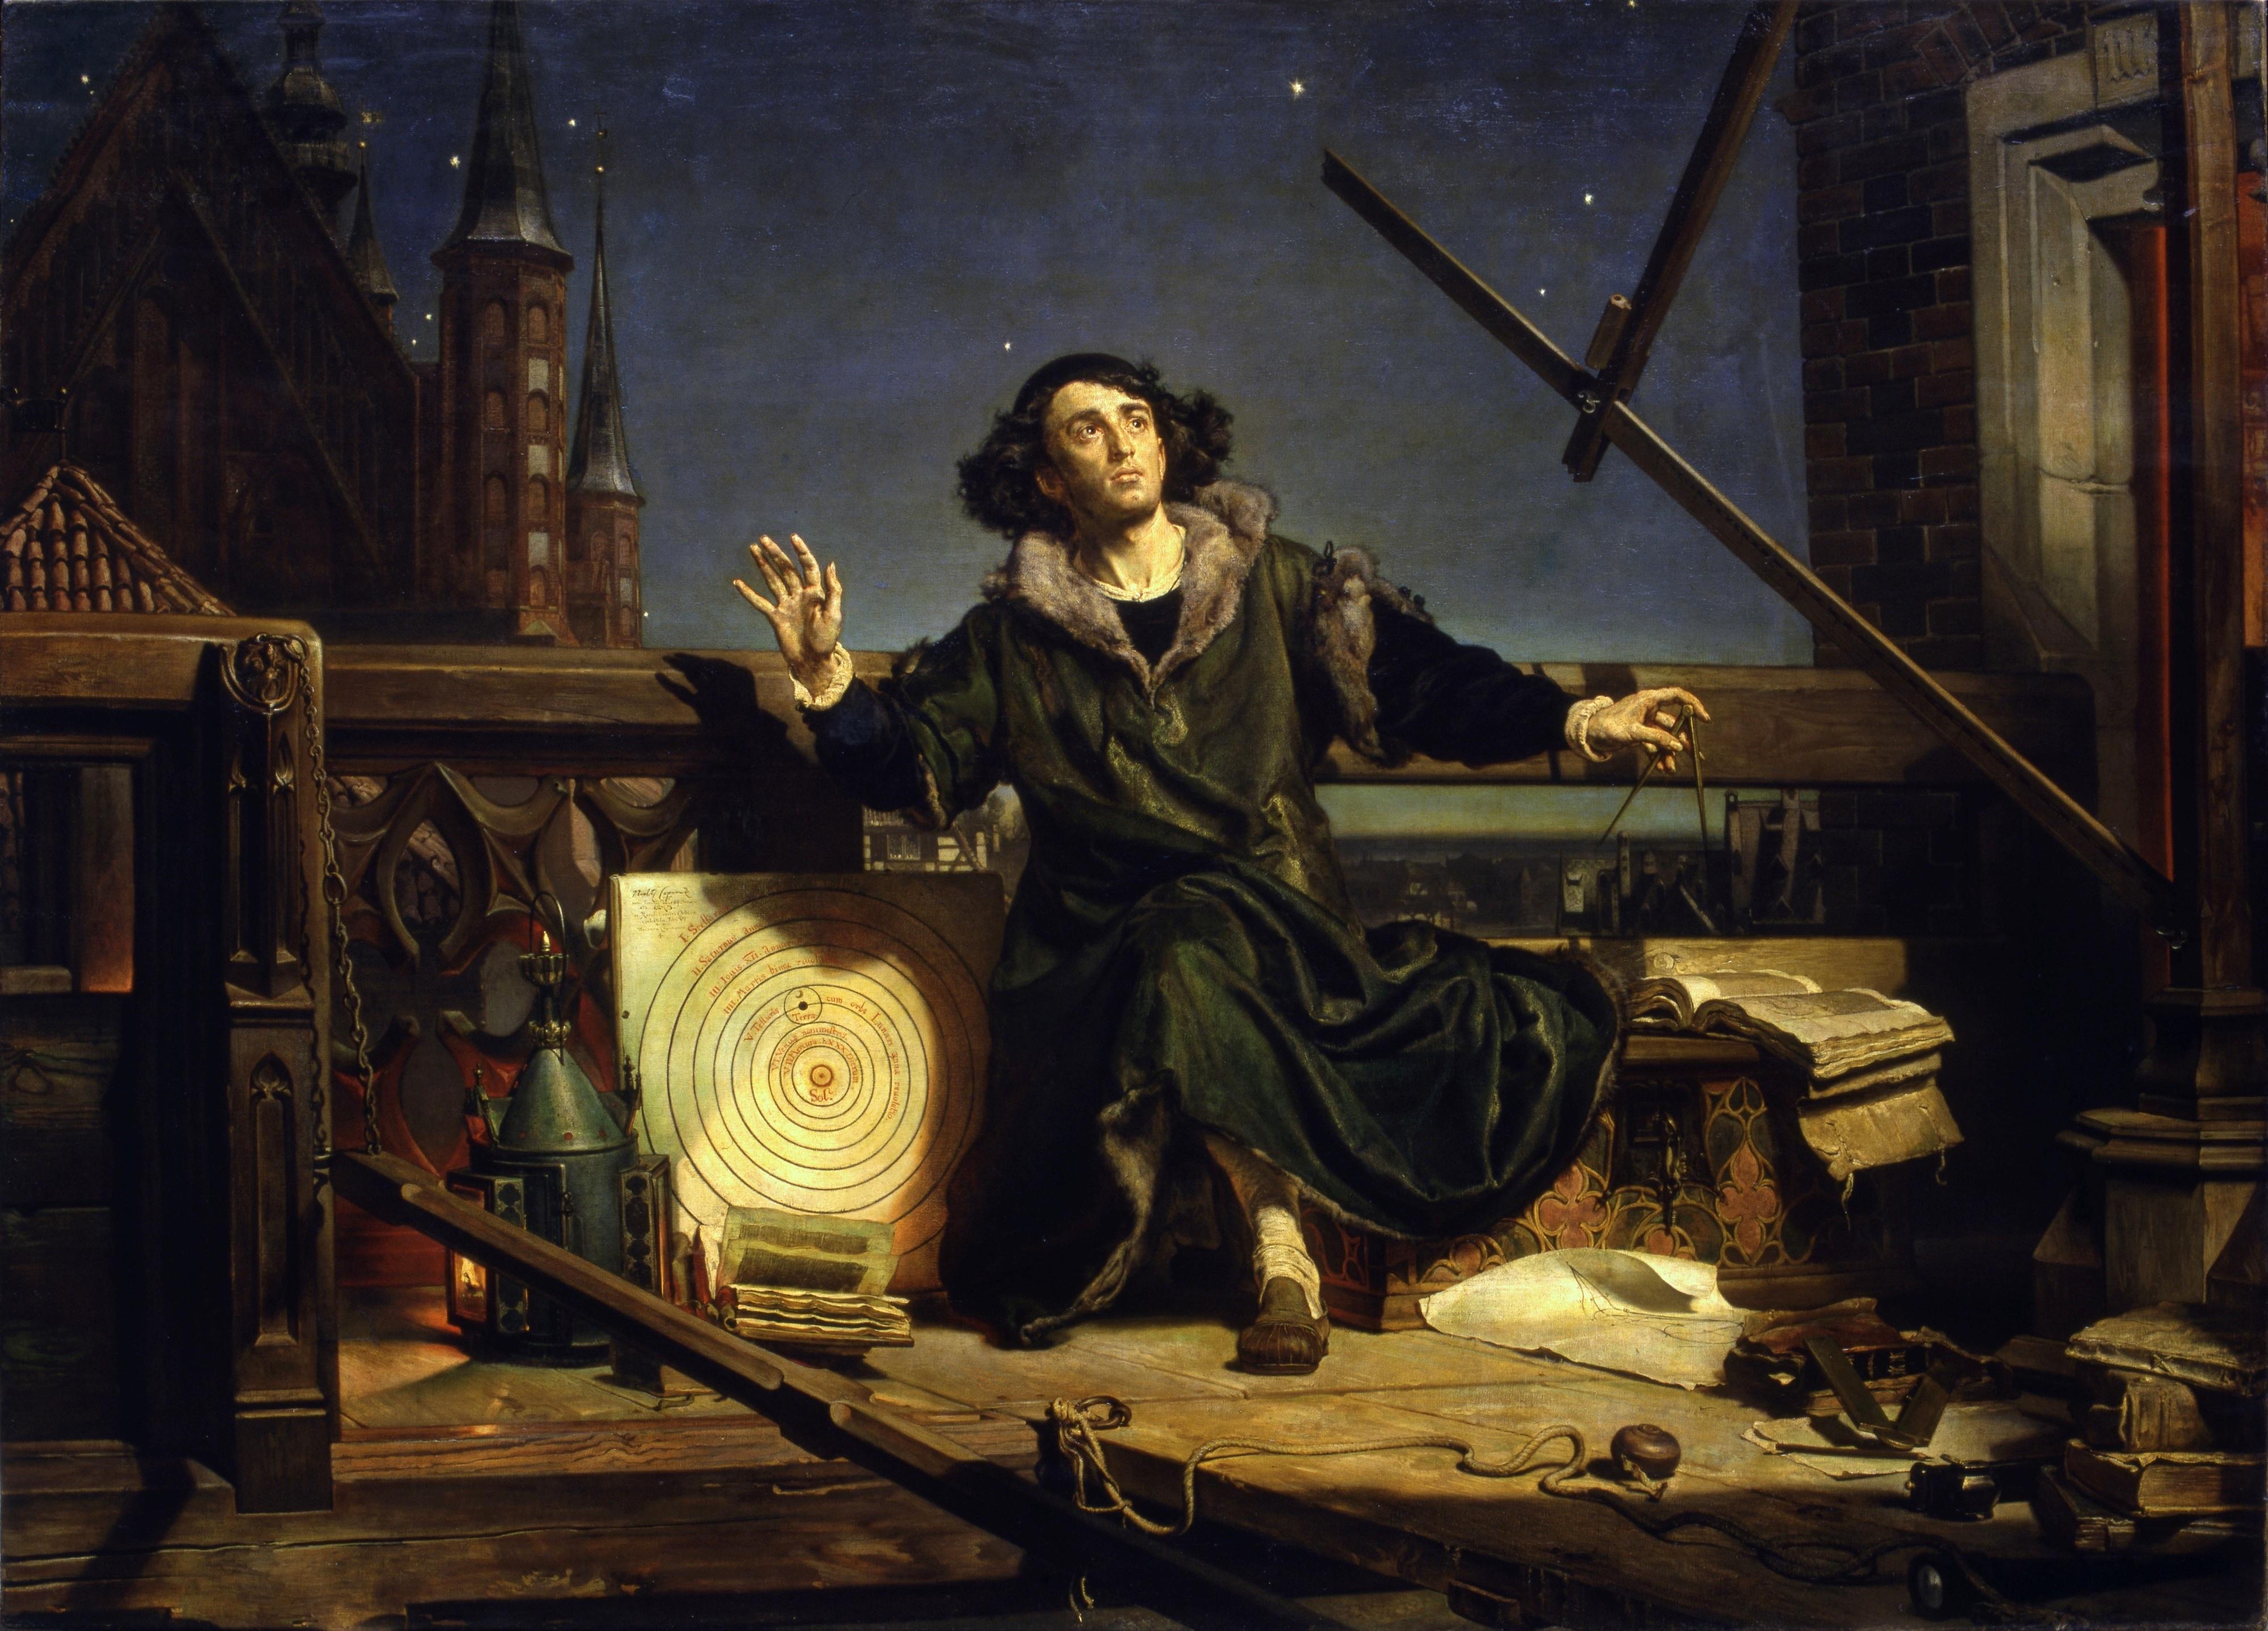 Jan Matejko, 1872. Astronomer Copernicus. Conversation with God.